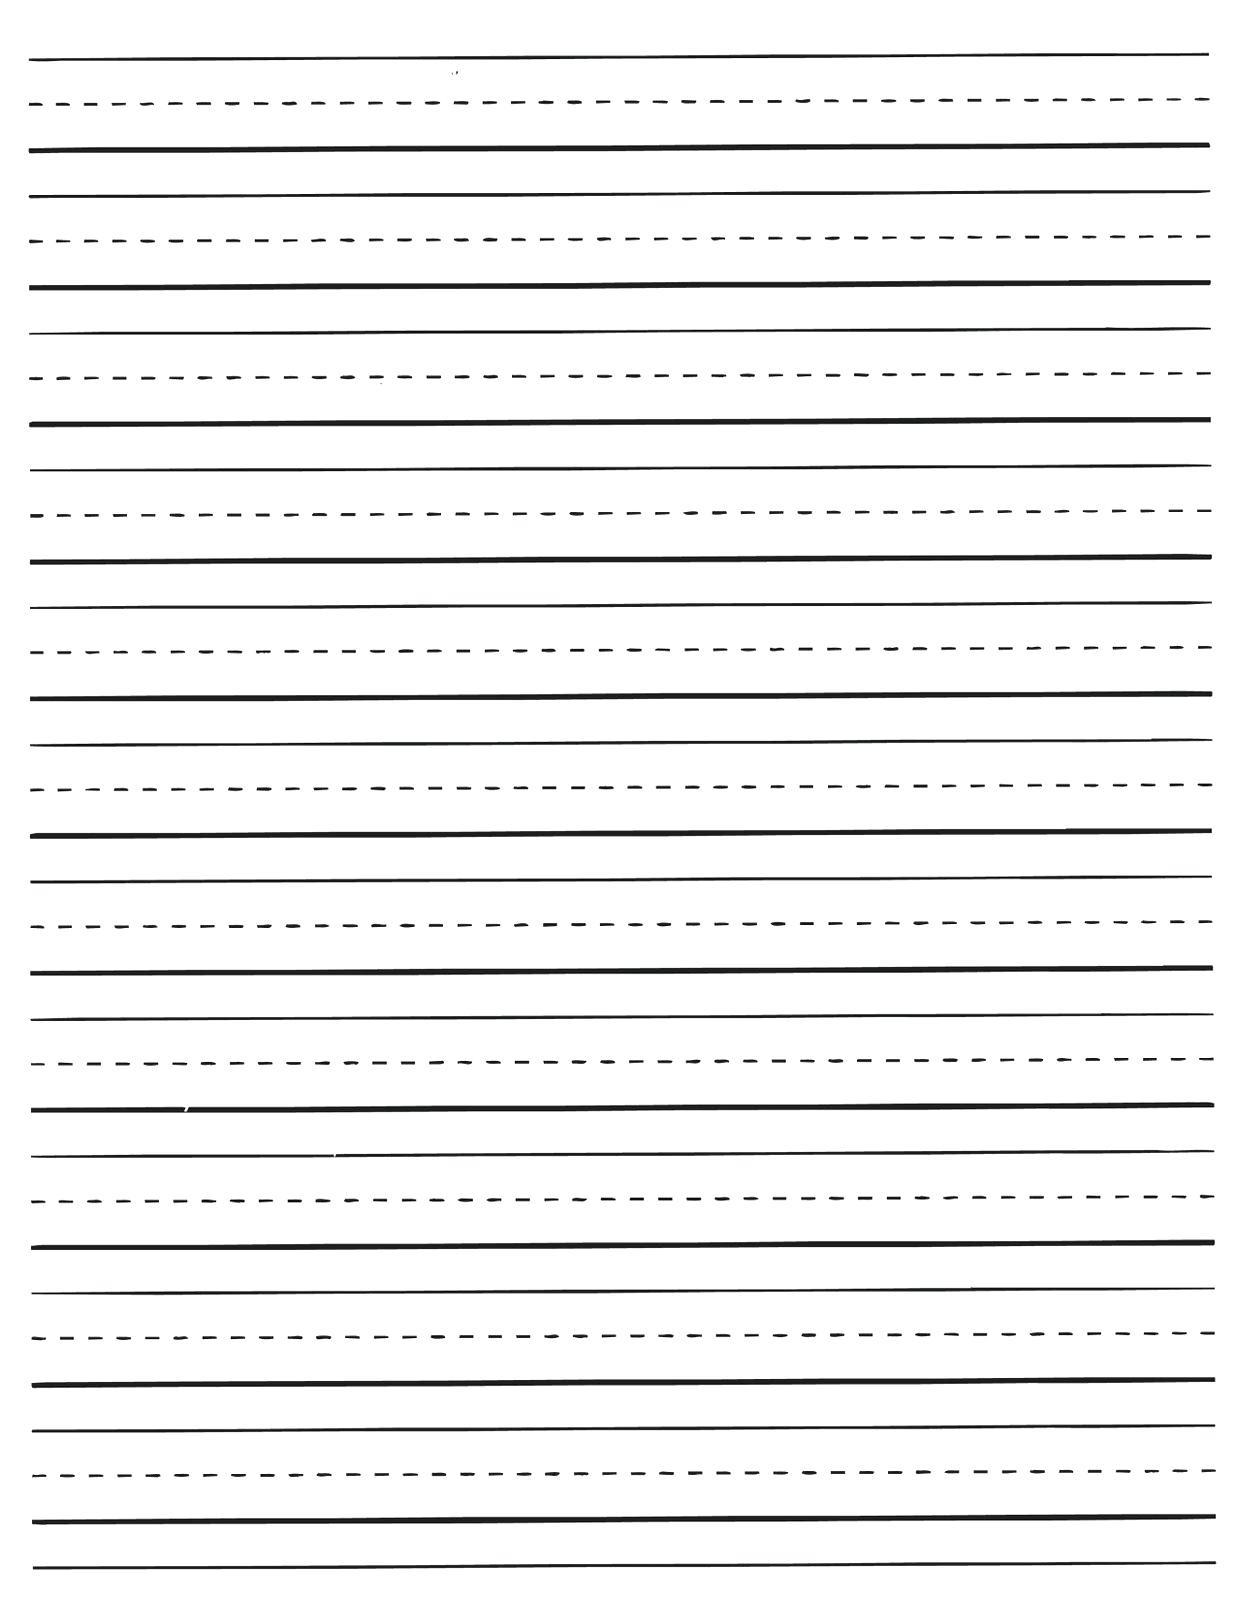 Printable Preschool Writing Paper – Jpbitcoin.club - Free Printable Writing Paper With Picture Box